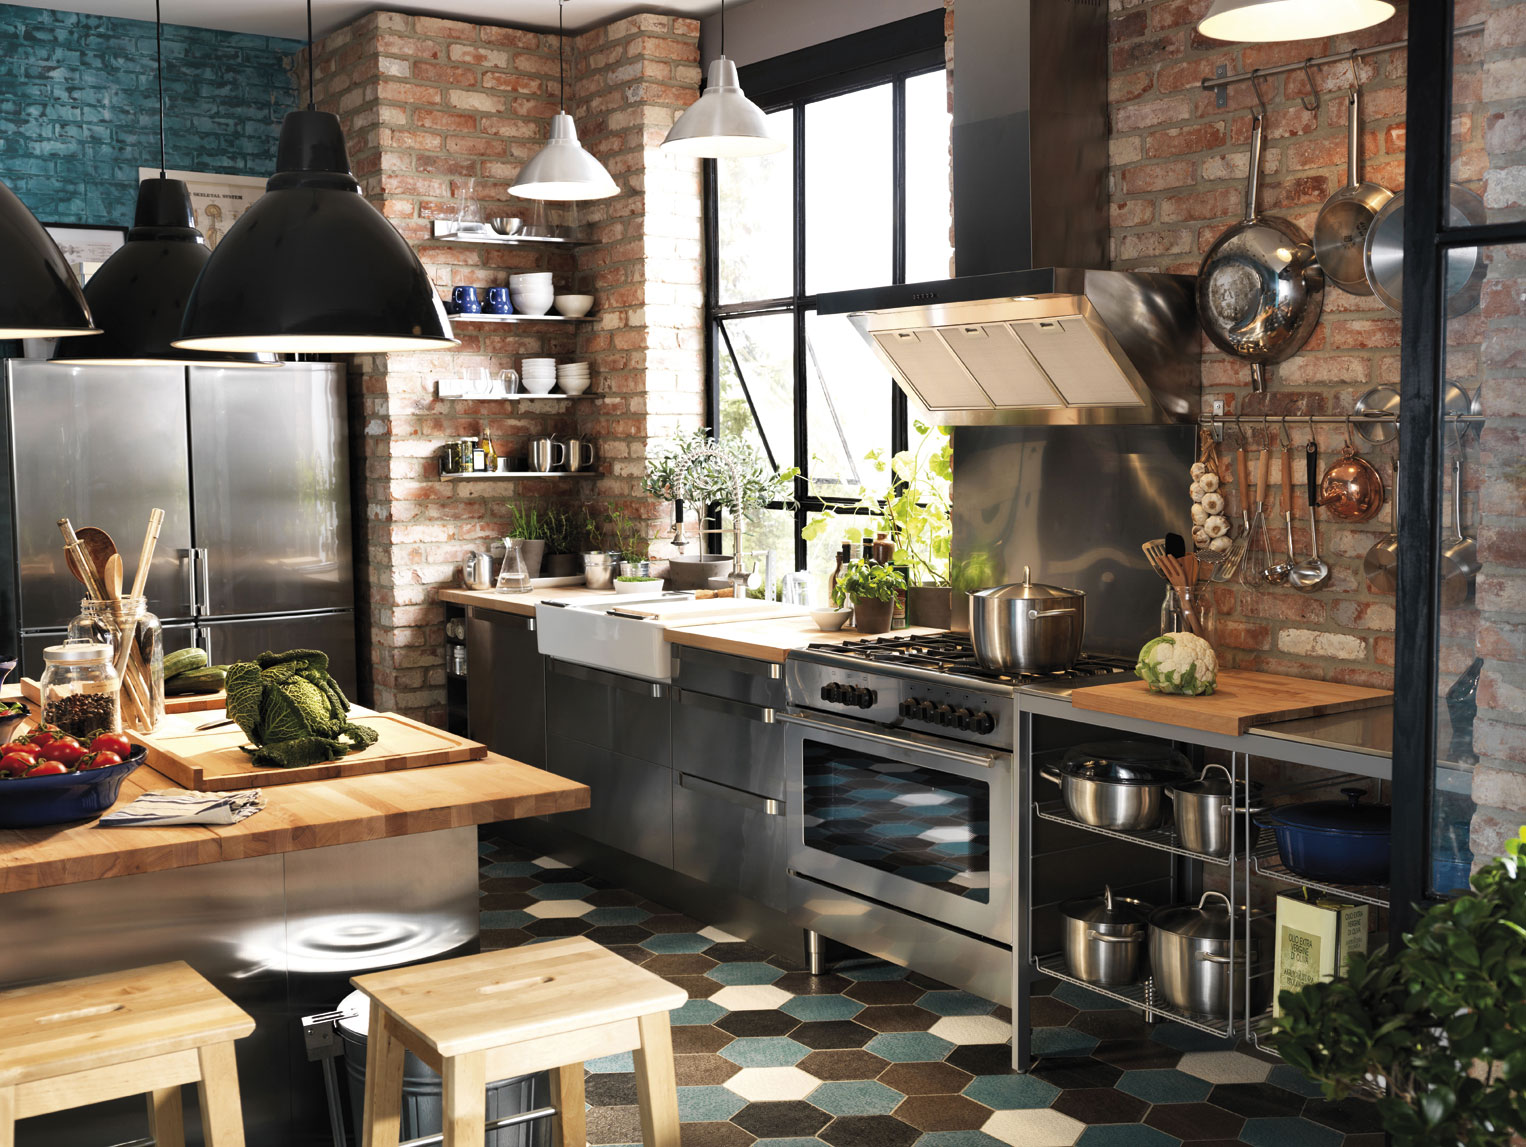 Fotos Cocinas Ikea | Ikea Cocinas 26